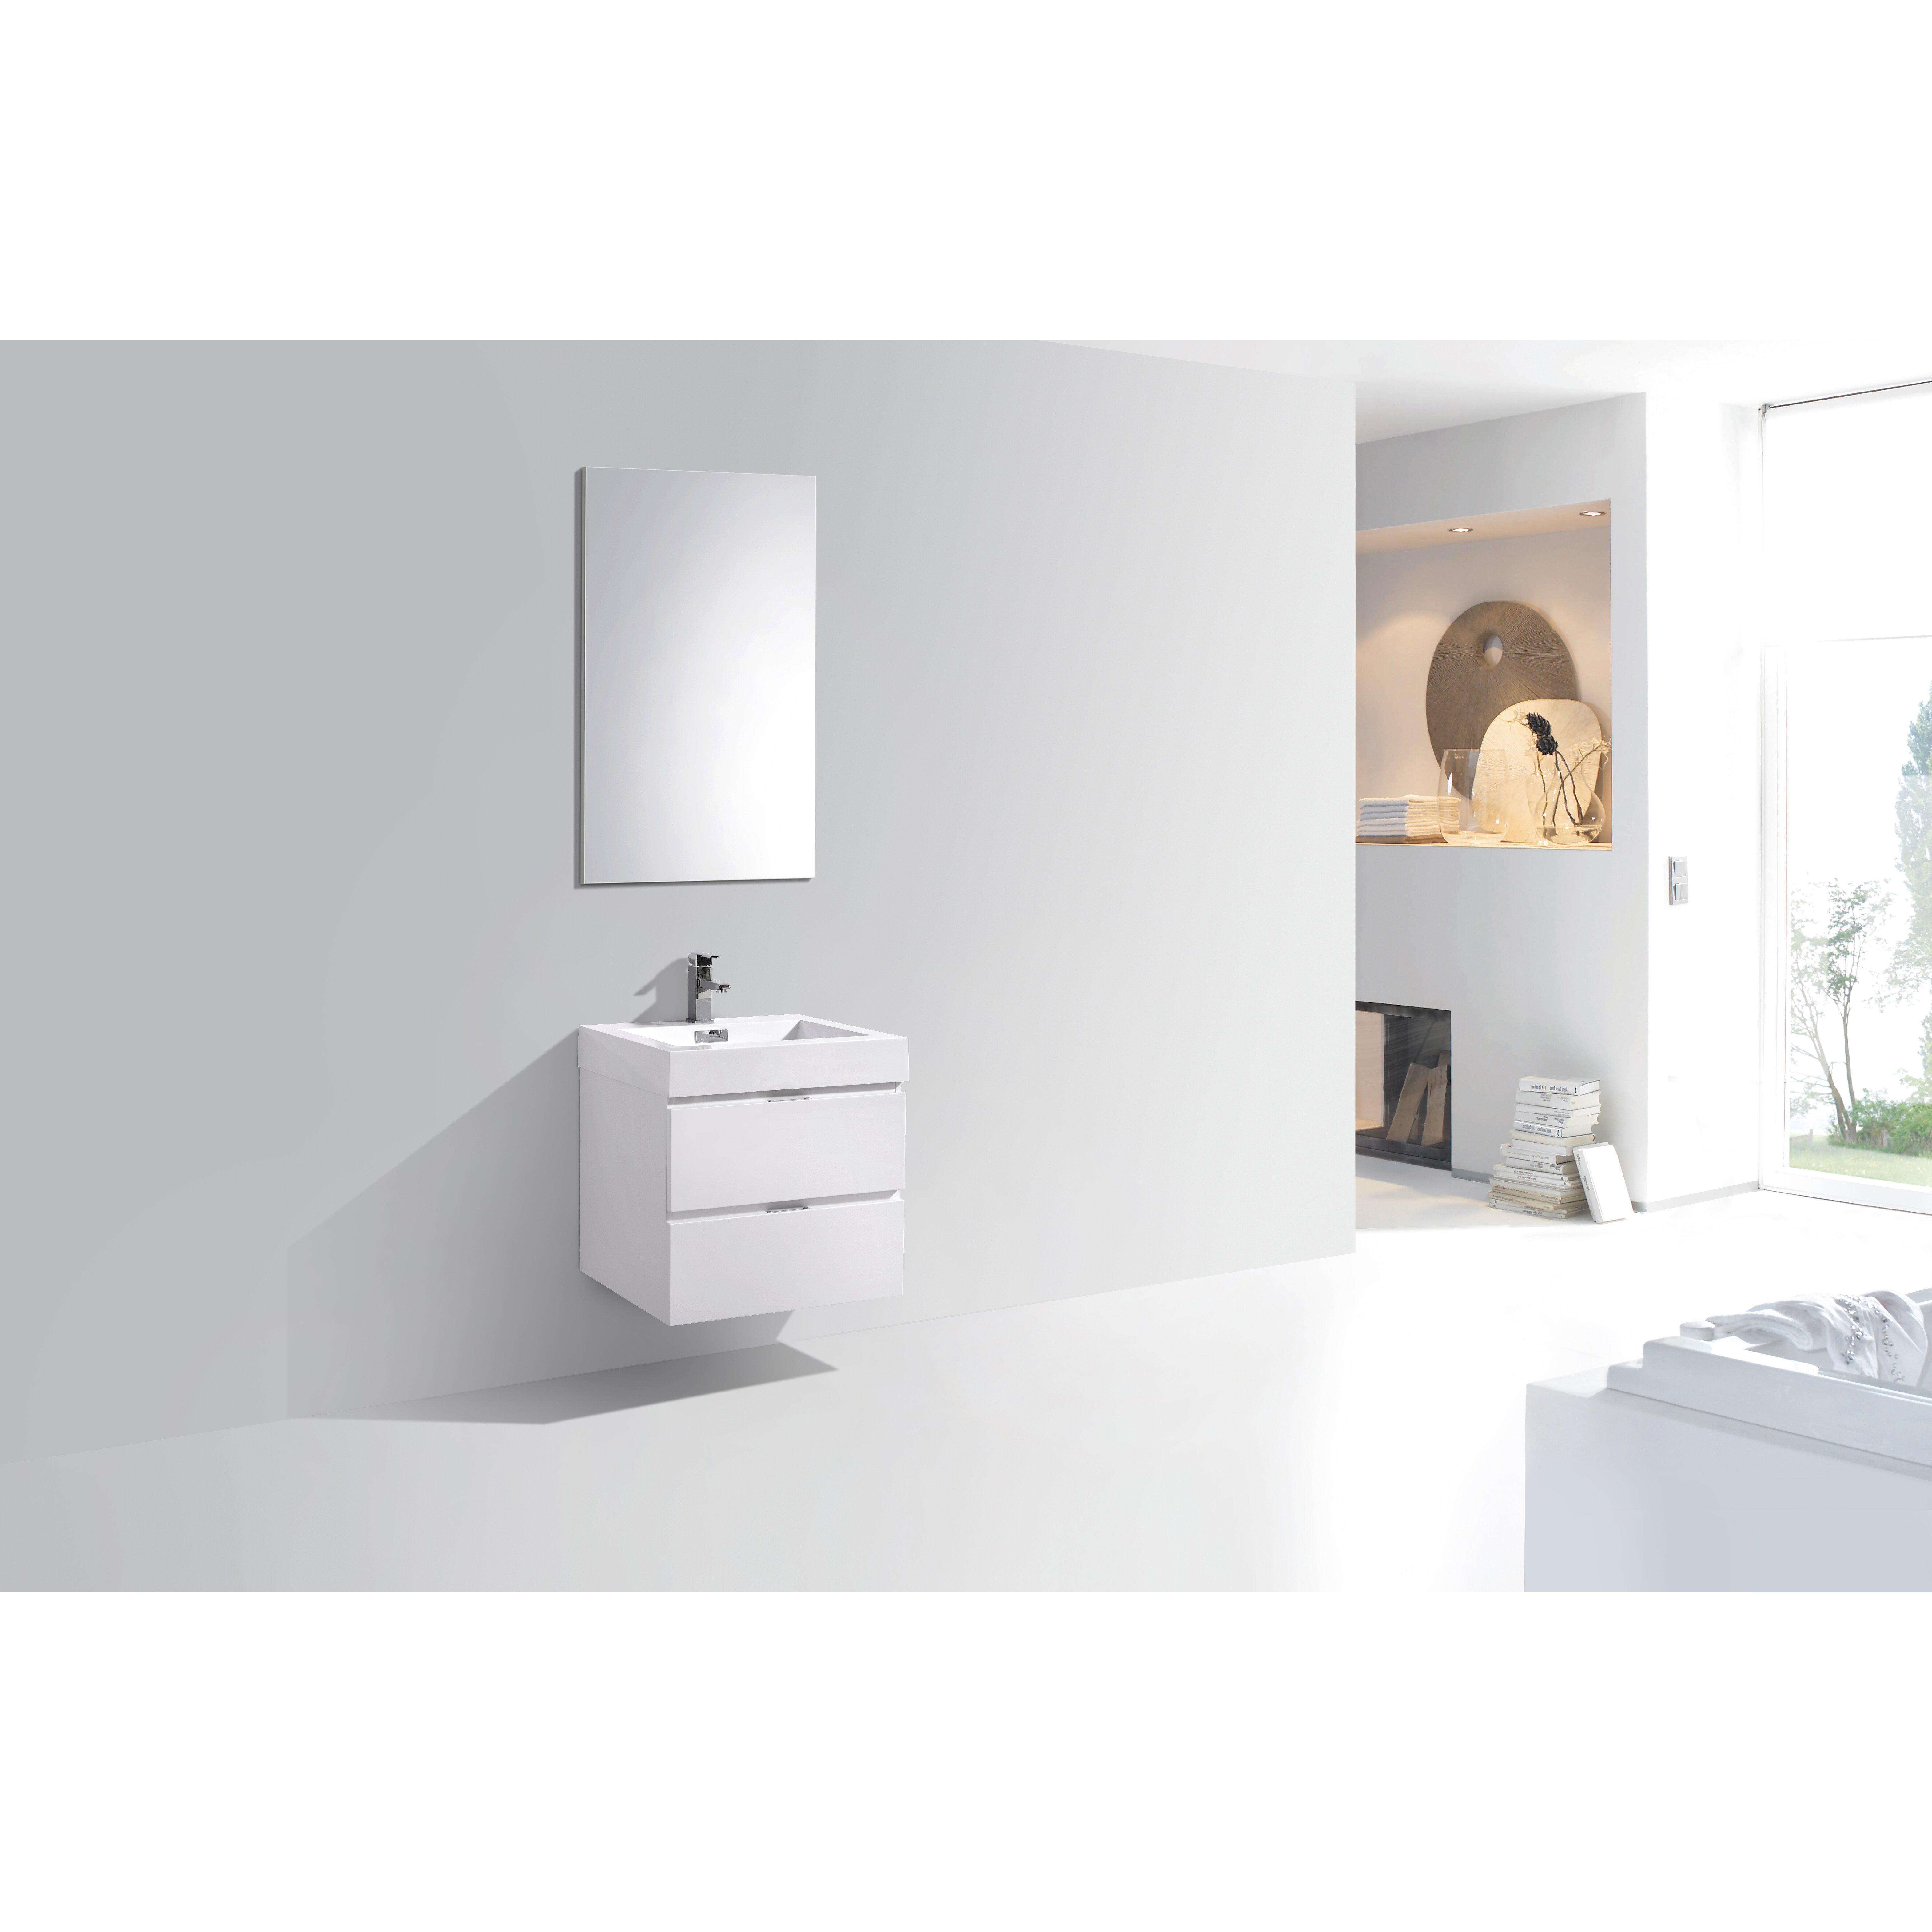 Modern Bathroom Vanity Wade Logan Tenafly 24 Single Wall Mount Modern Bathroom Vanity